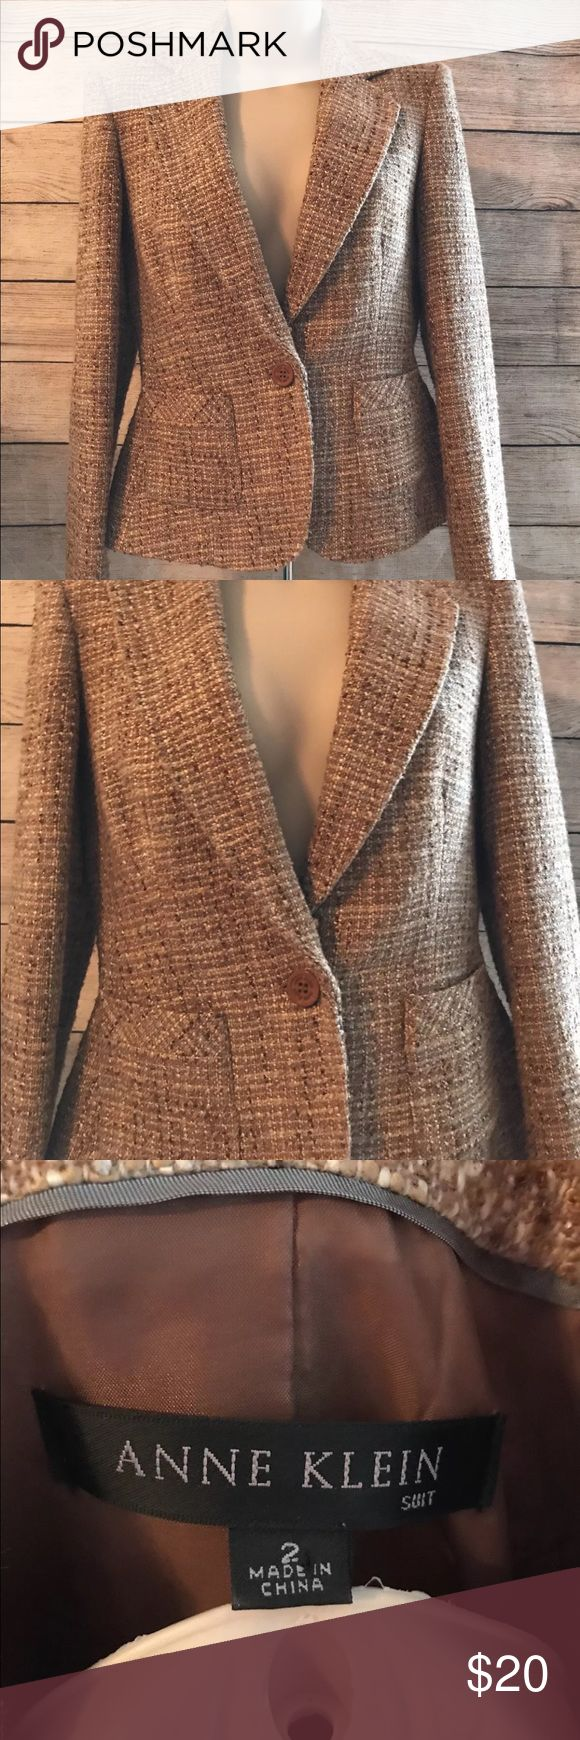 "Anne Klein Women's Tweed Fitted Blazer Jacket 2 Anne Klein Women's Tan Tweed Fitted Single Button Blazer Jacket Coat Size  Measures 19"" from armpit to armpit to armpit  Measures 21 1/2"" from shoulder seam to bottom hem. EUC Anne Klein Jackets & Coats Blazers"